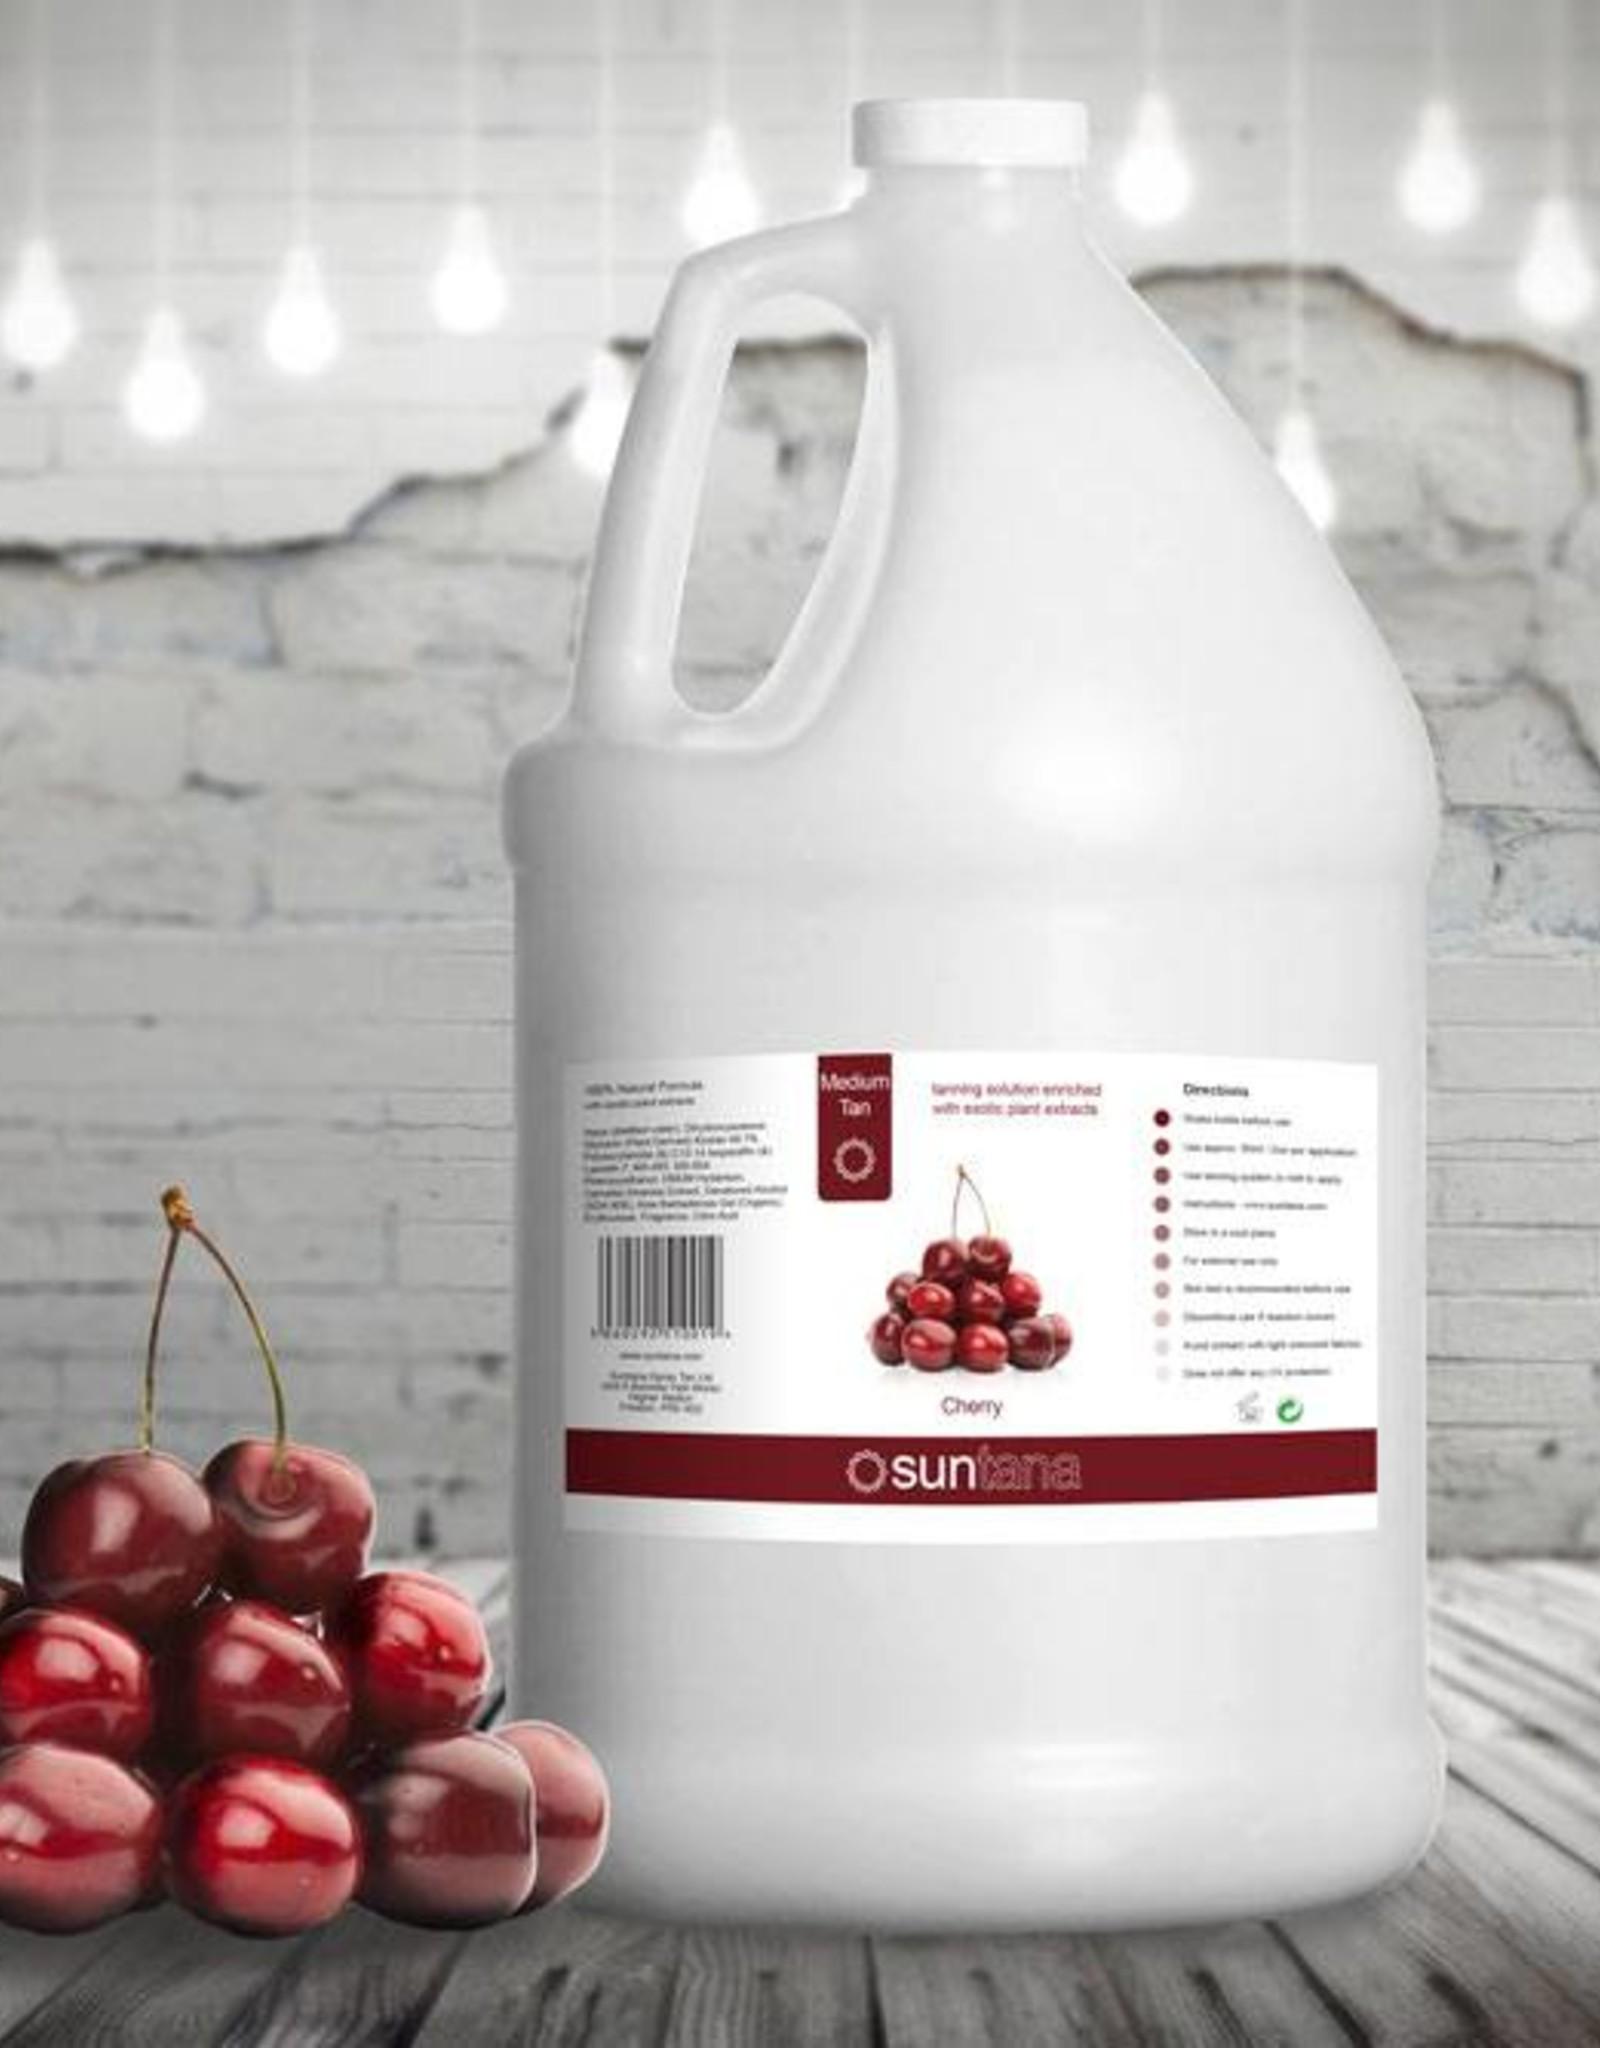 Suntana Suntana Cherry - 10% DHA - Spray Tan vloeistof